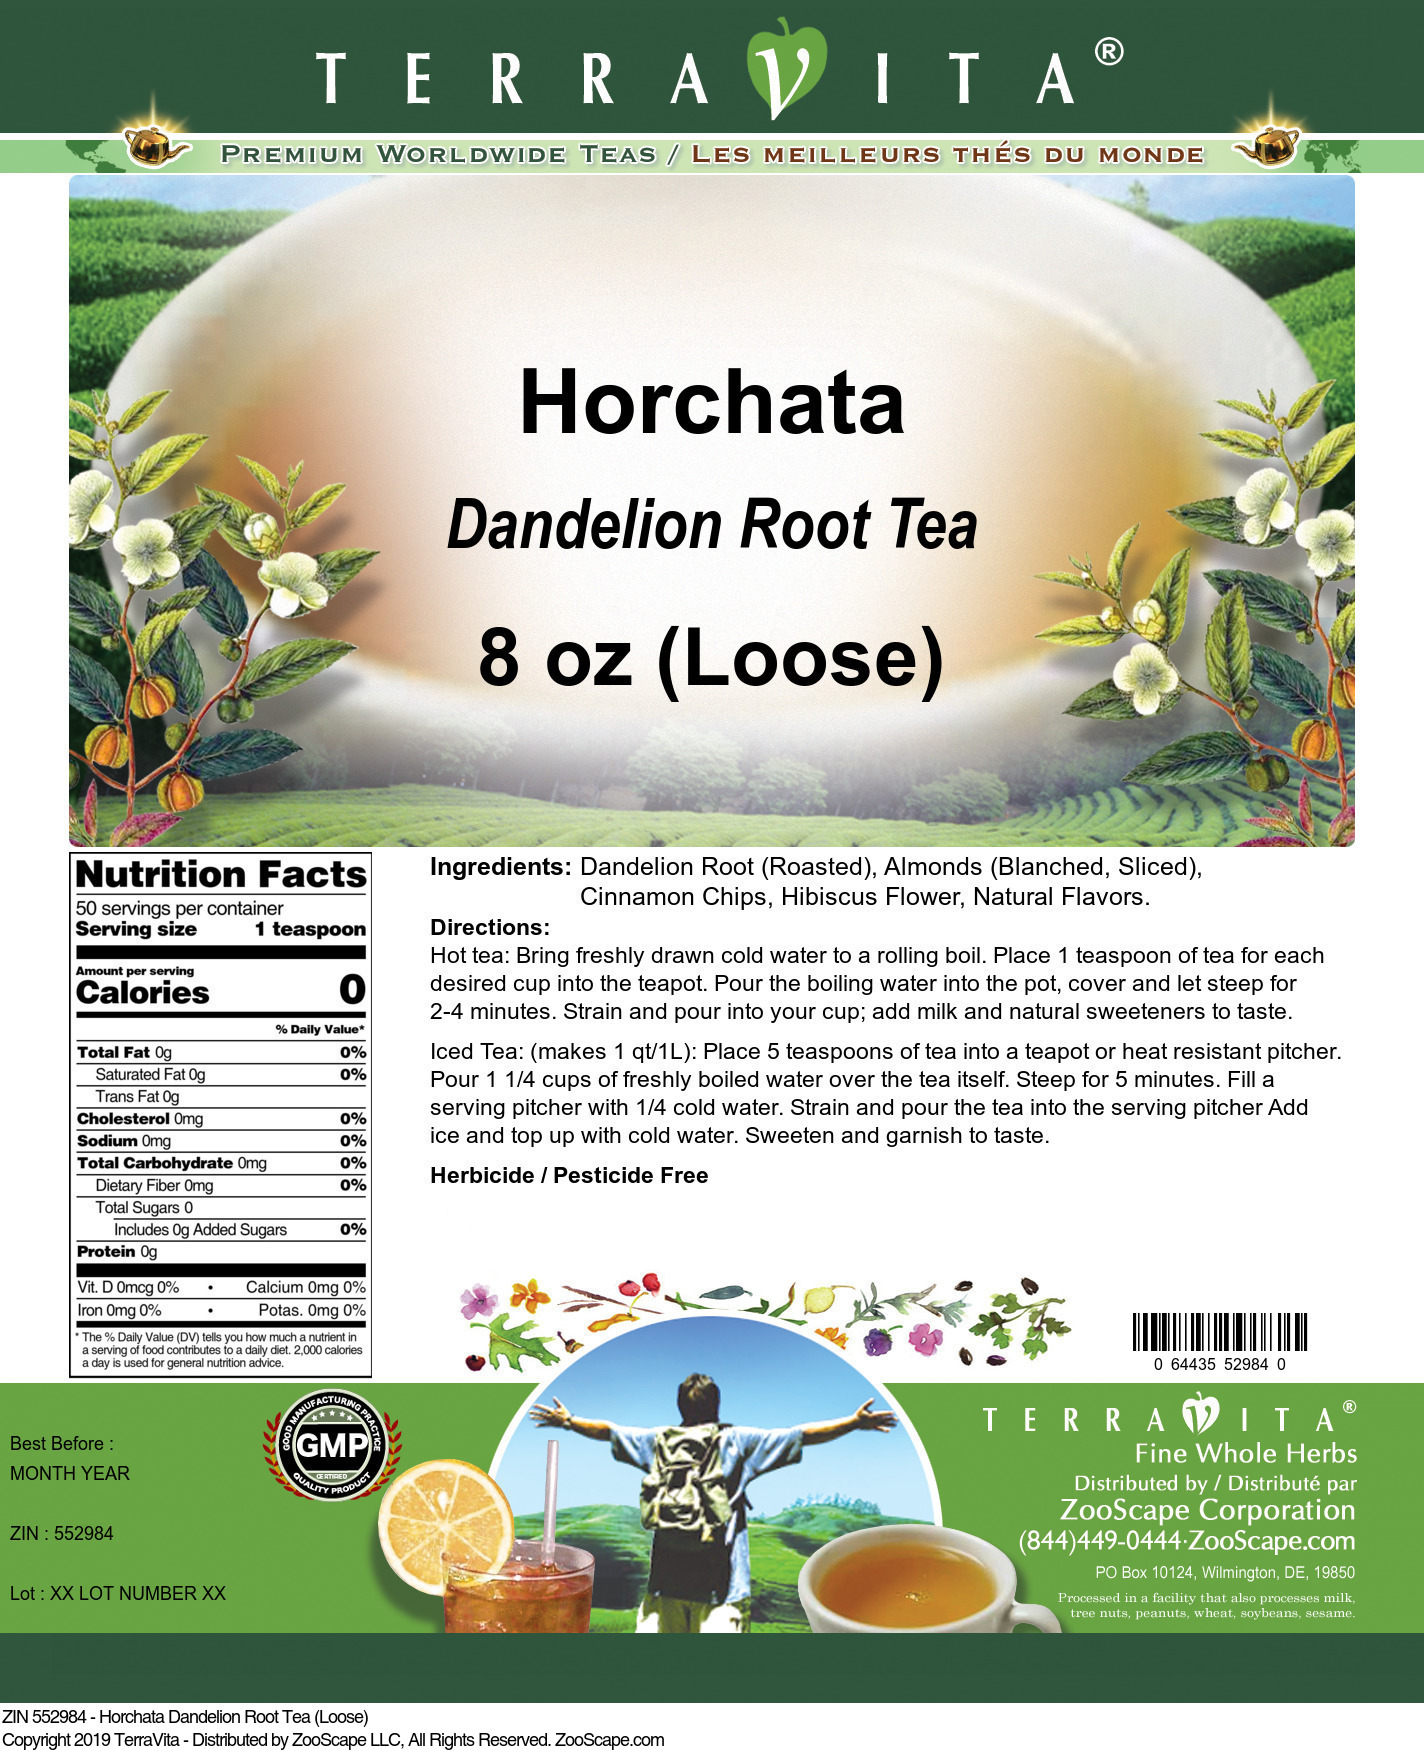 Horchata Dandelion Root